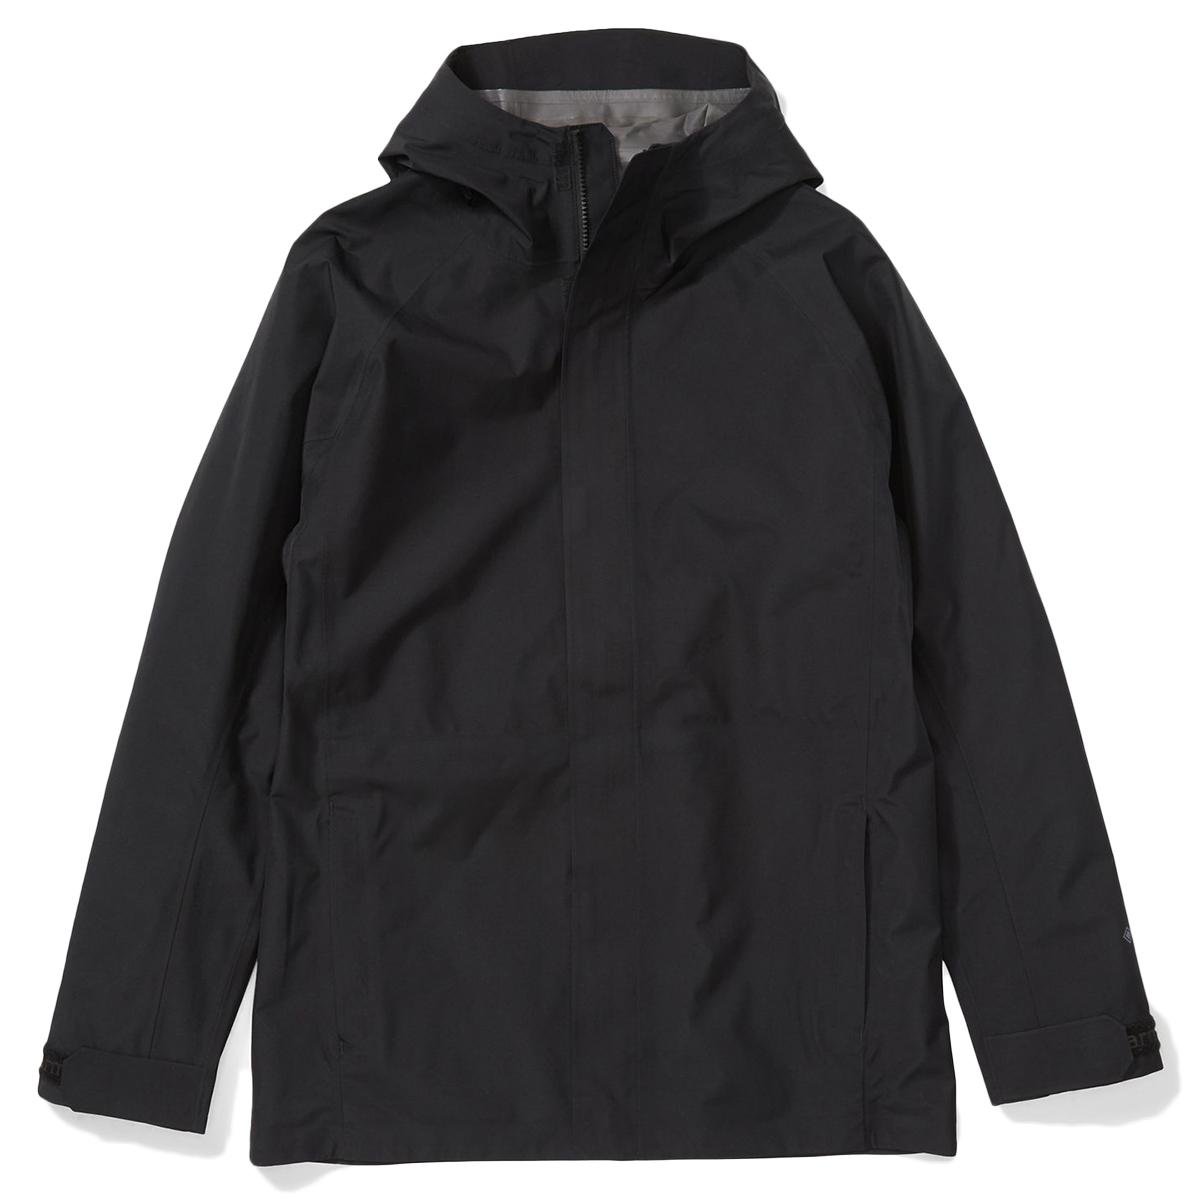 Marmot Men's Prescott Jacket - Black, S